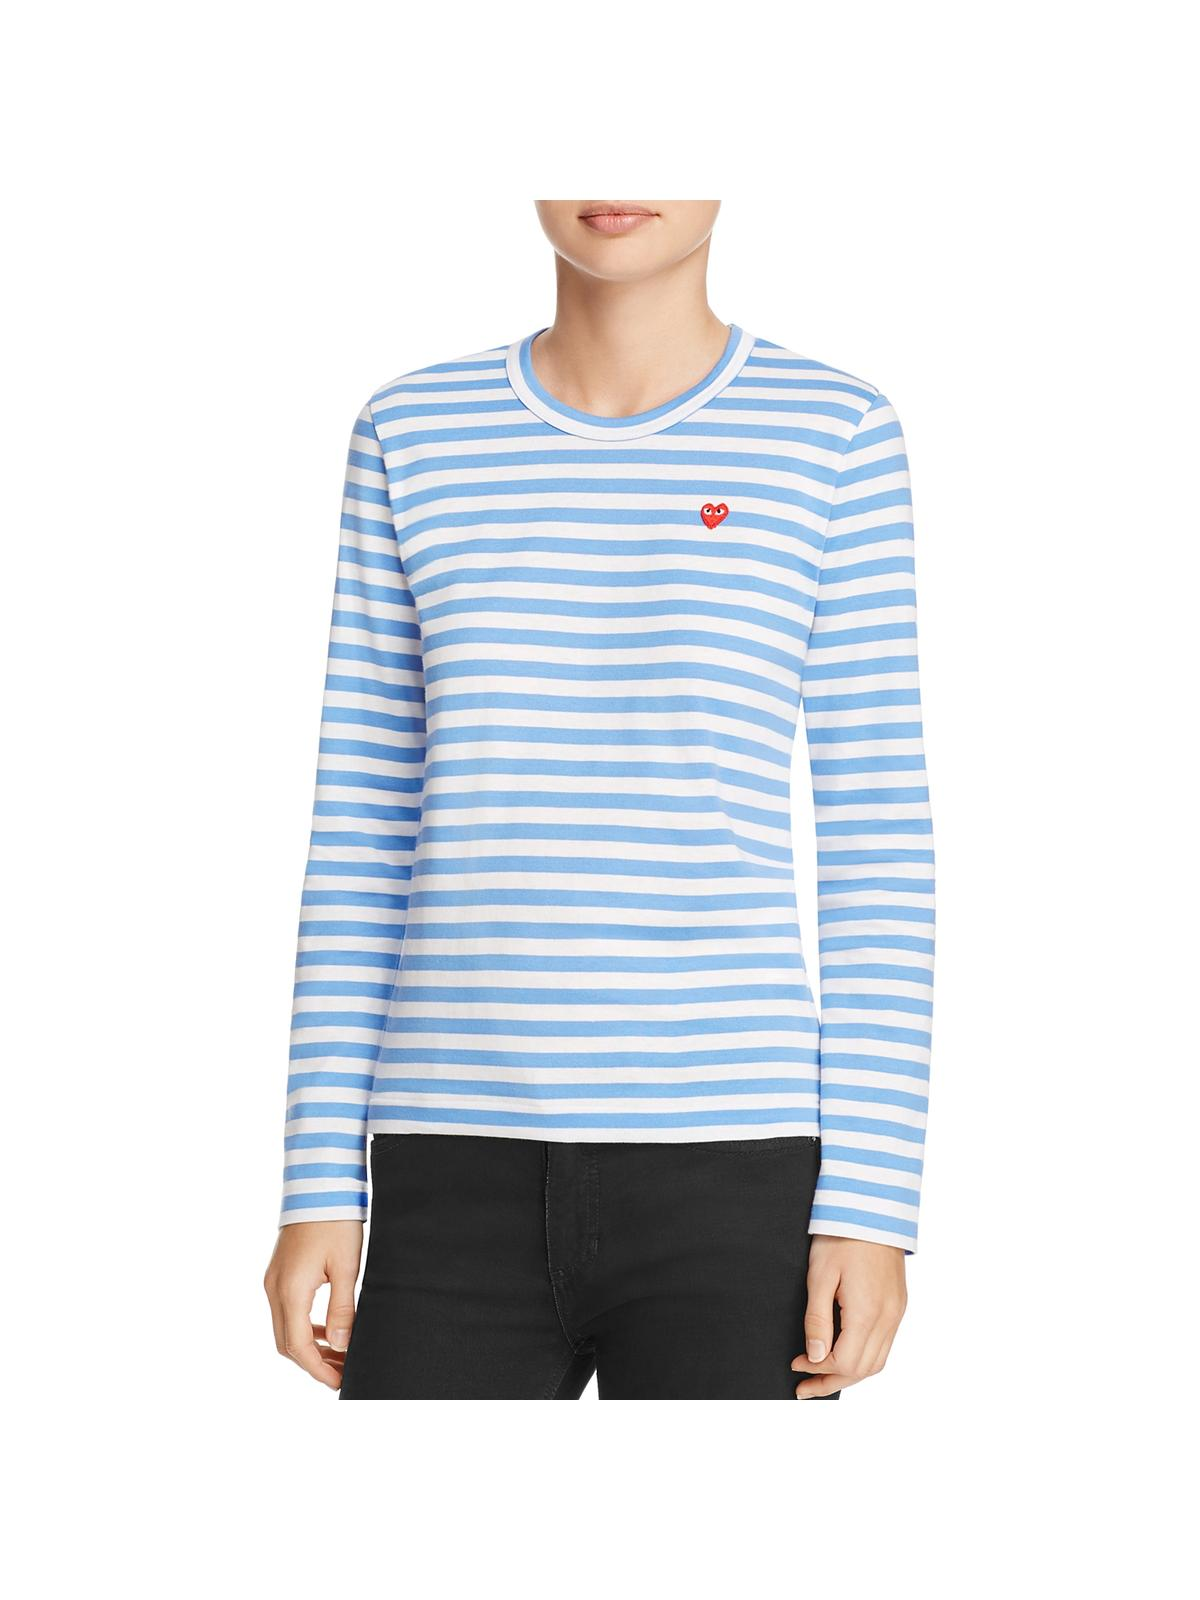 3fb8d66ca8e2 Comme Des Garcons - Comme des Garcons Womens Striped Long Sleeves Pullover  Top - Walmart.com